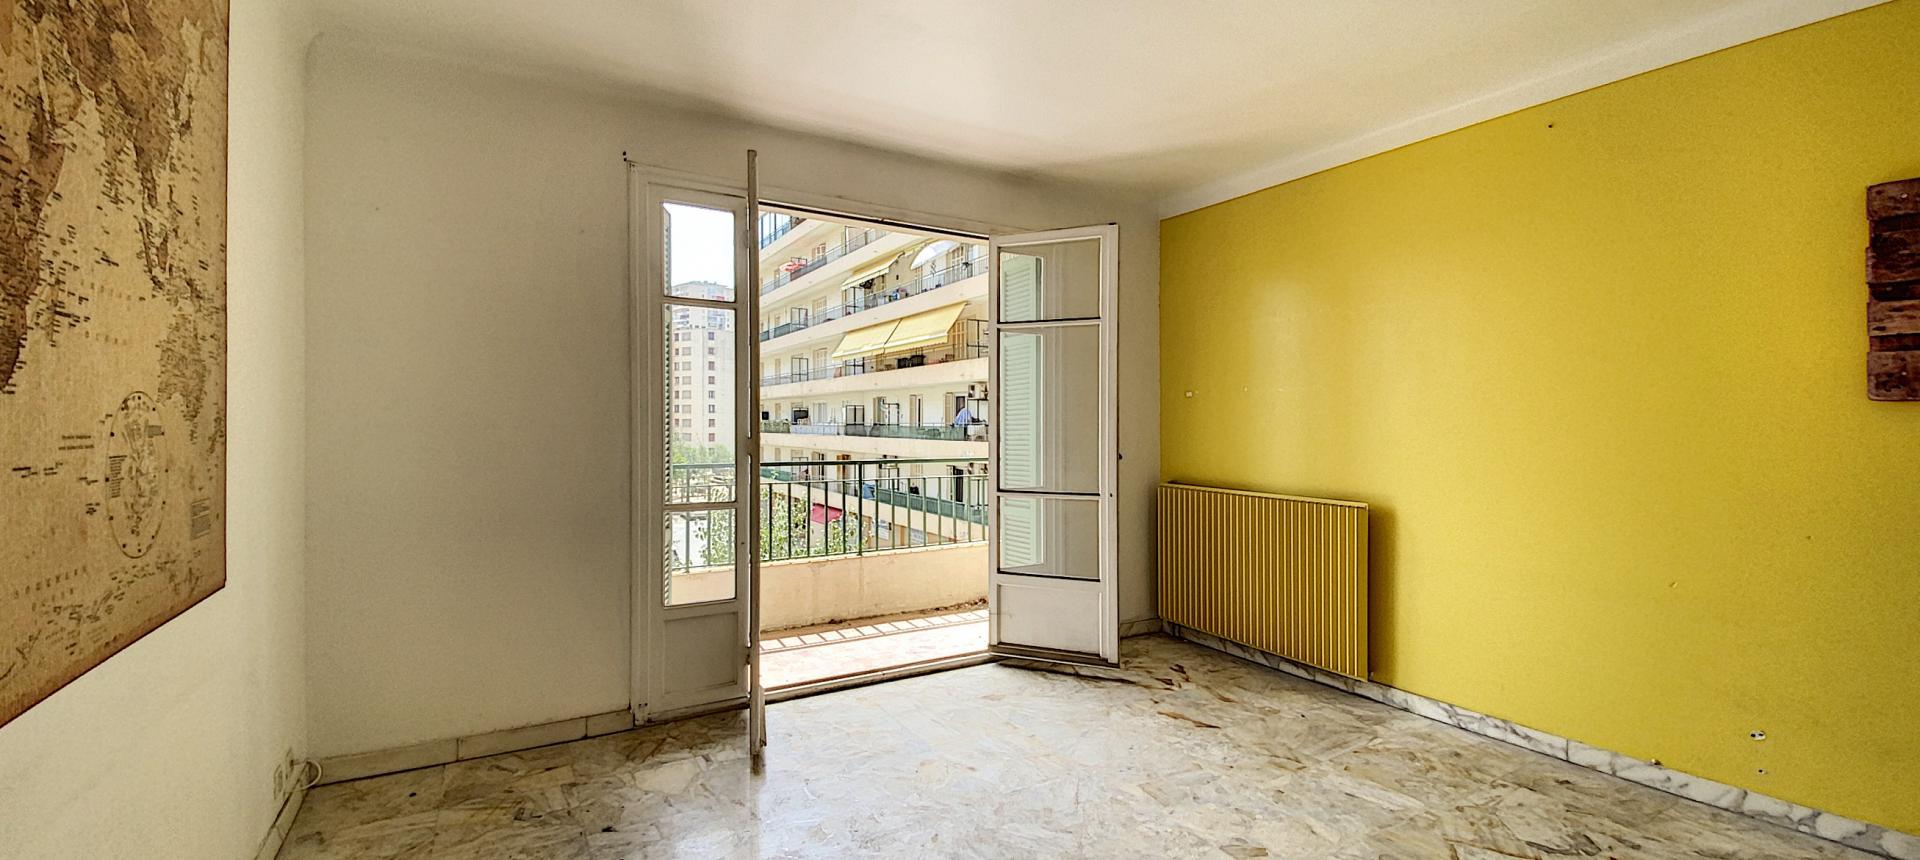 A vendre appartement F3 proche centre-ville - Vue salon